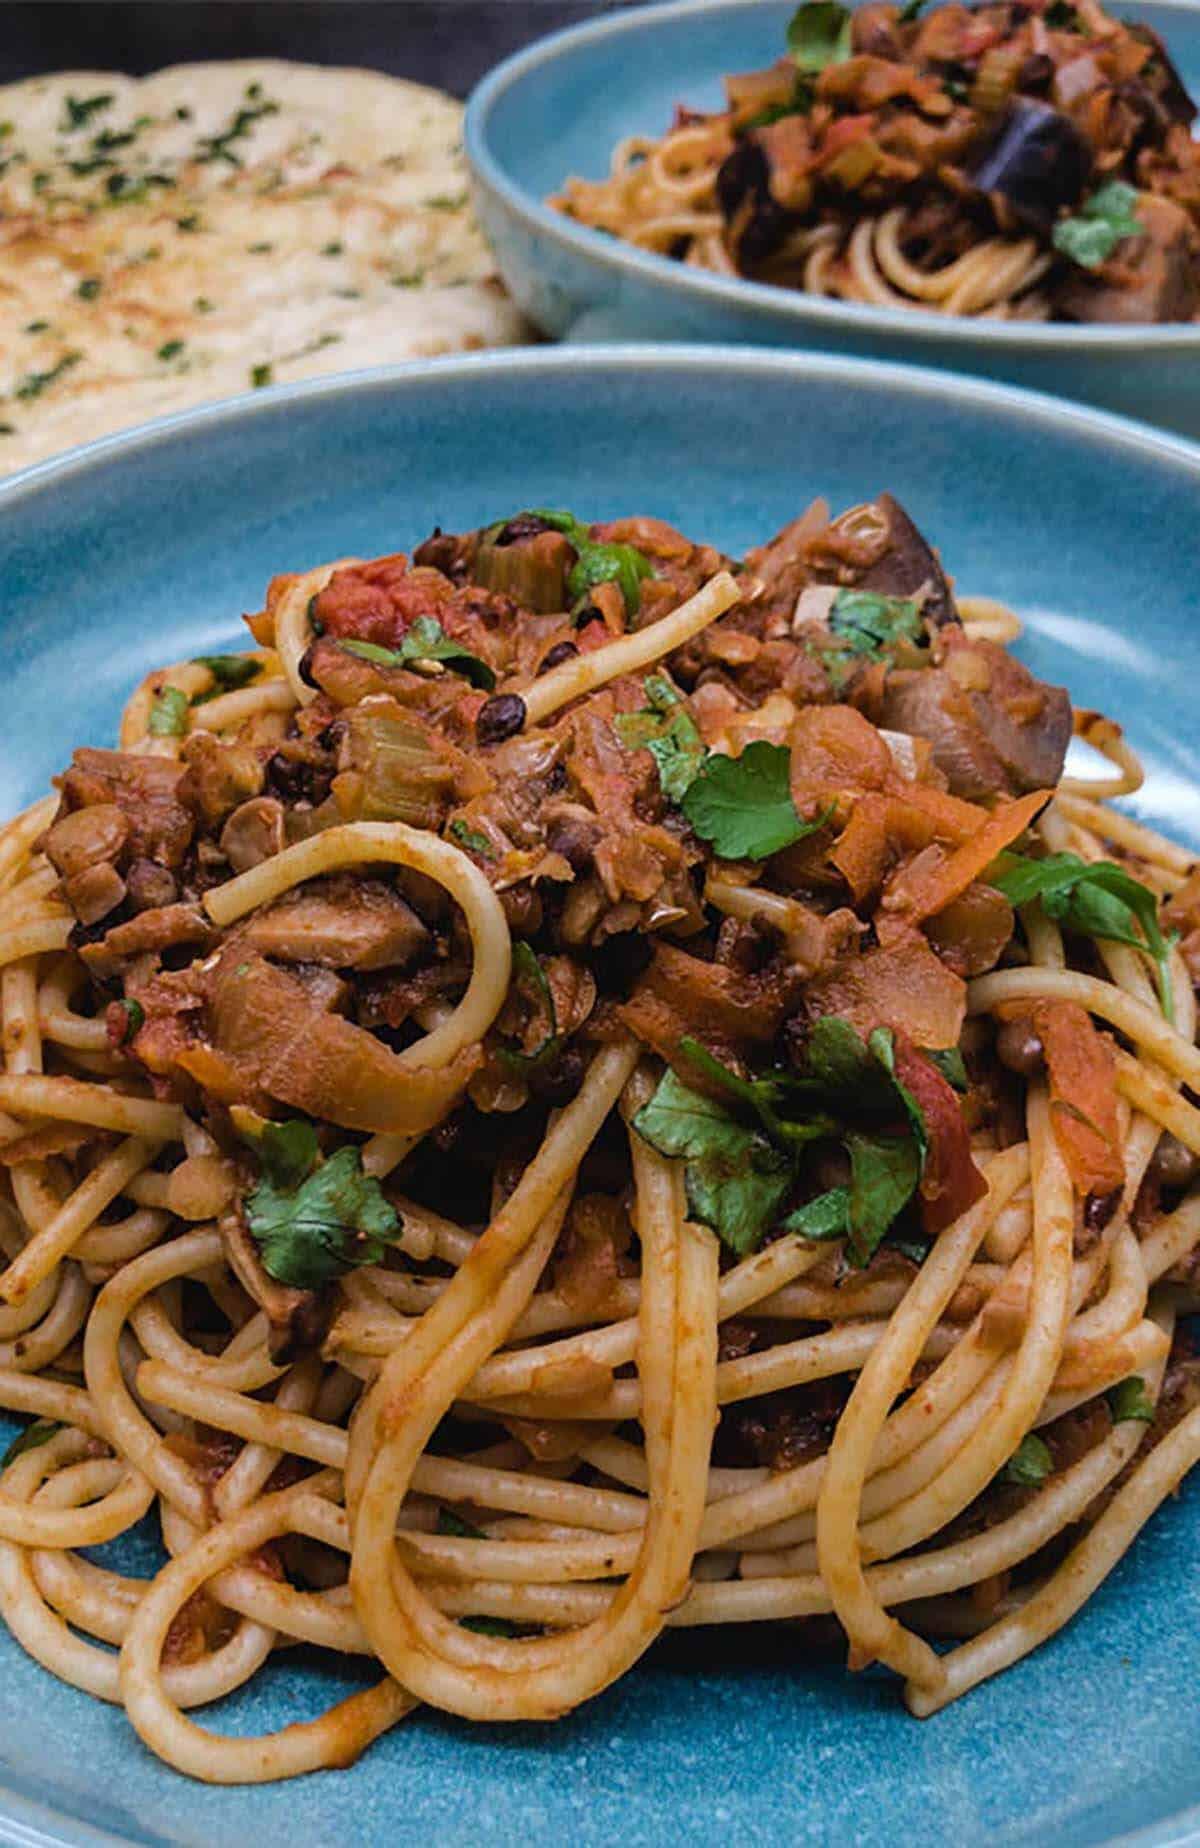 Delicious vegan spaghetti bolognese ready to eat